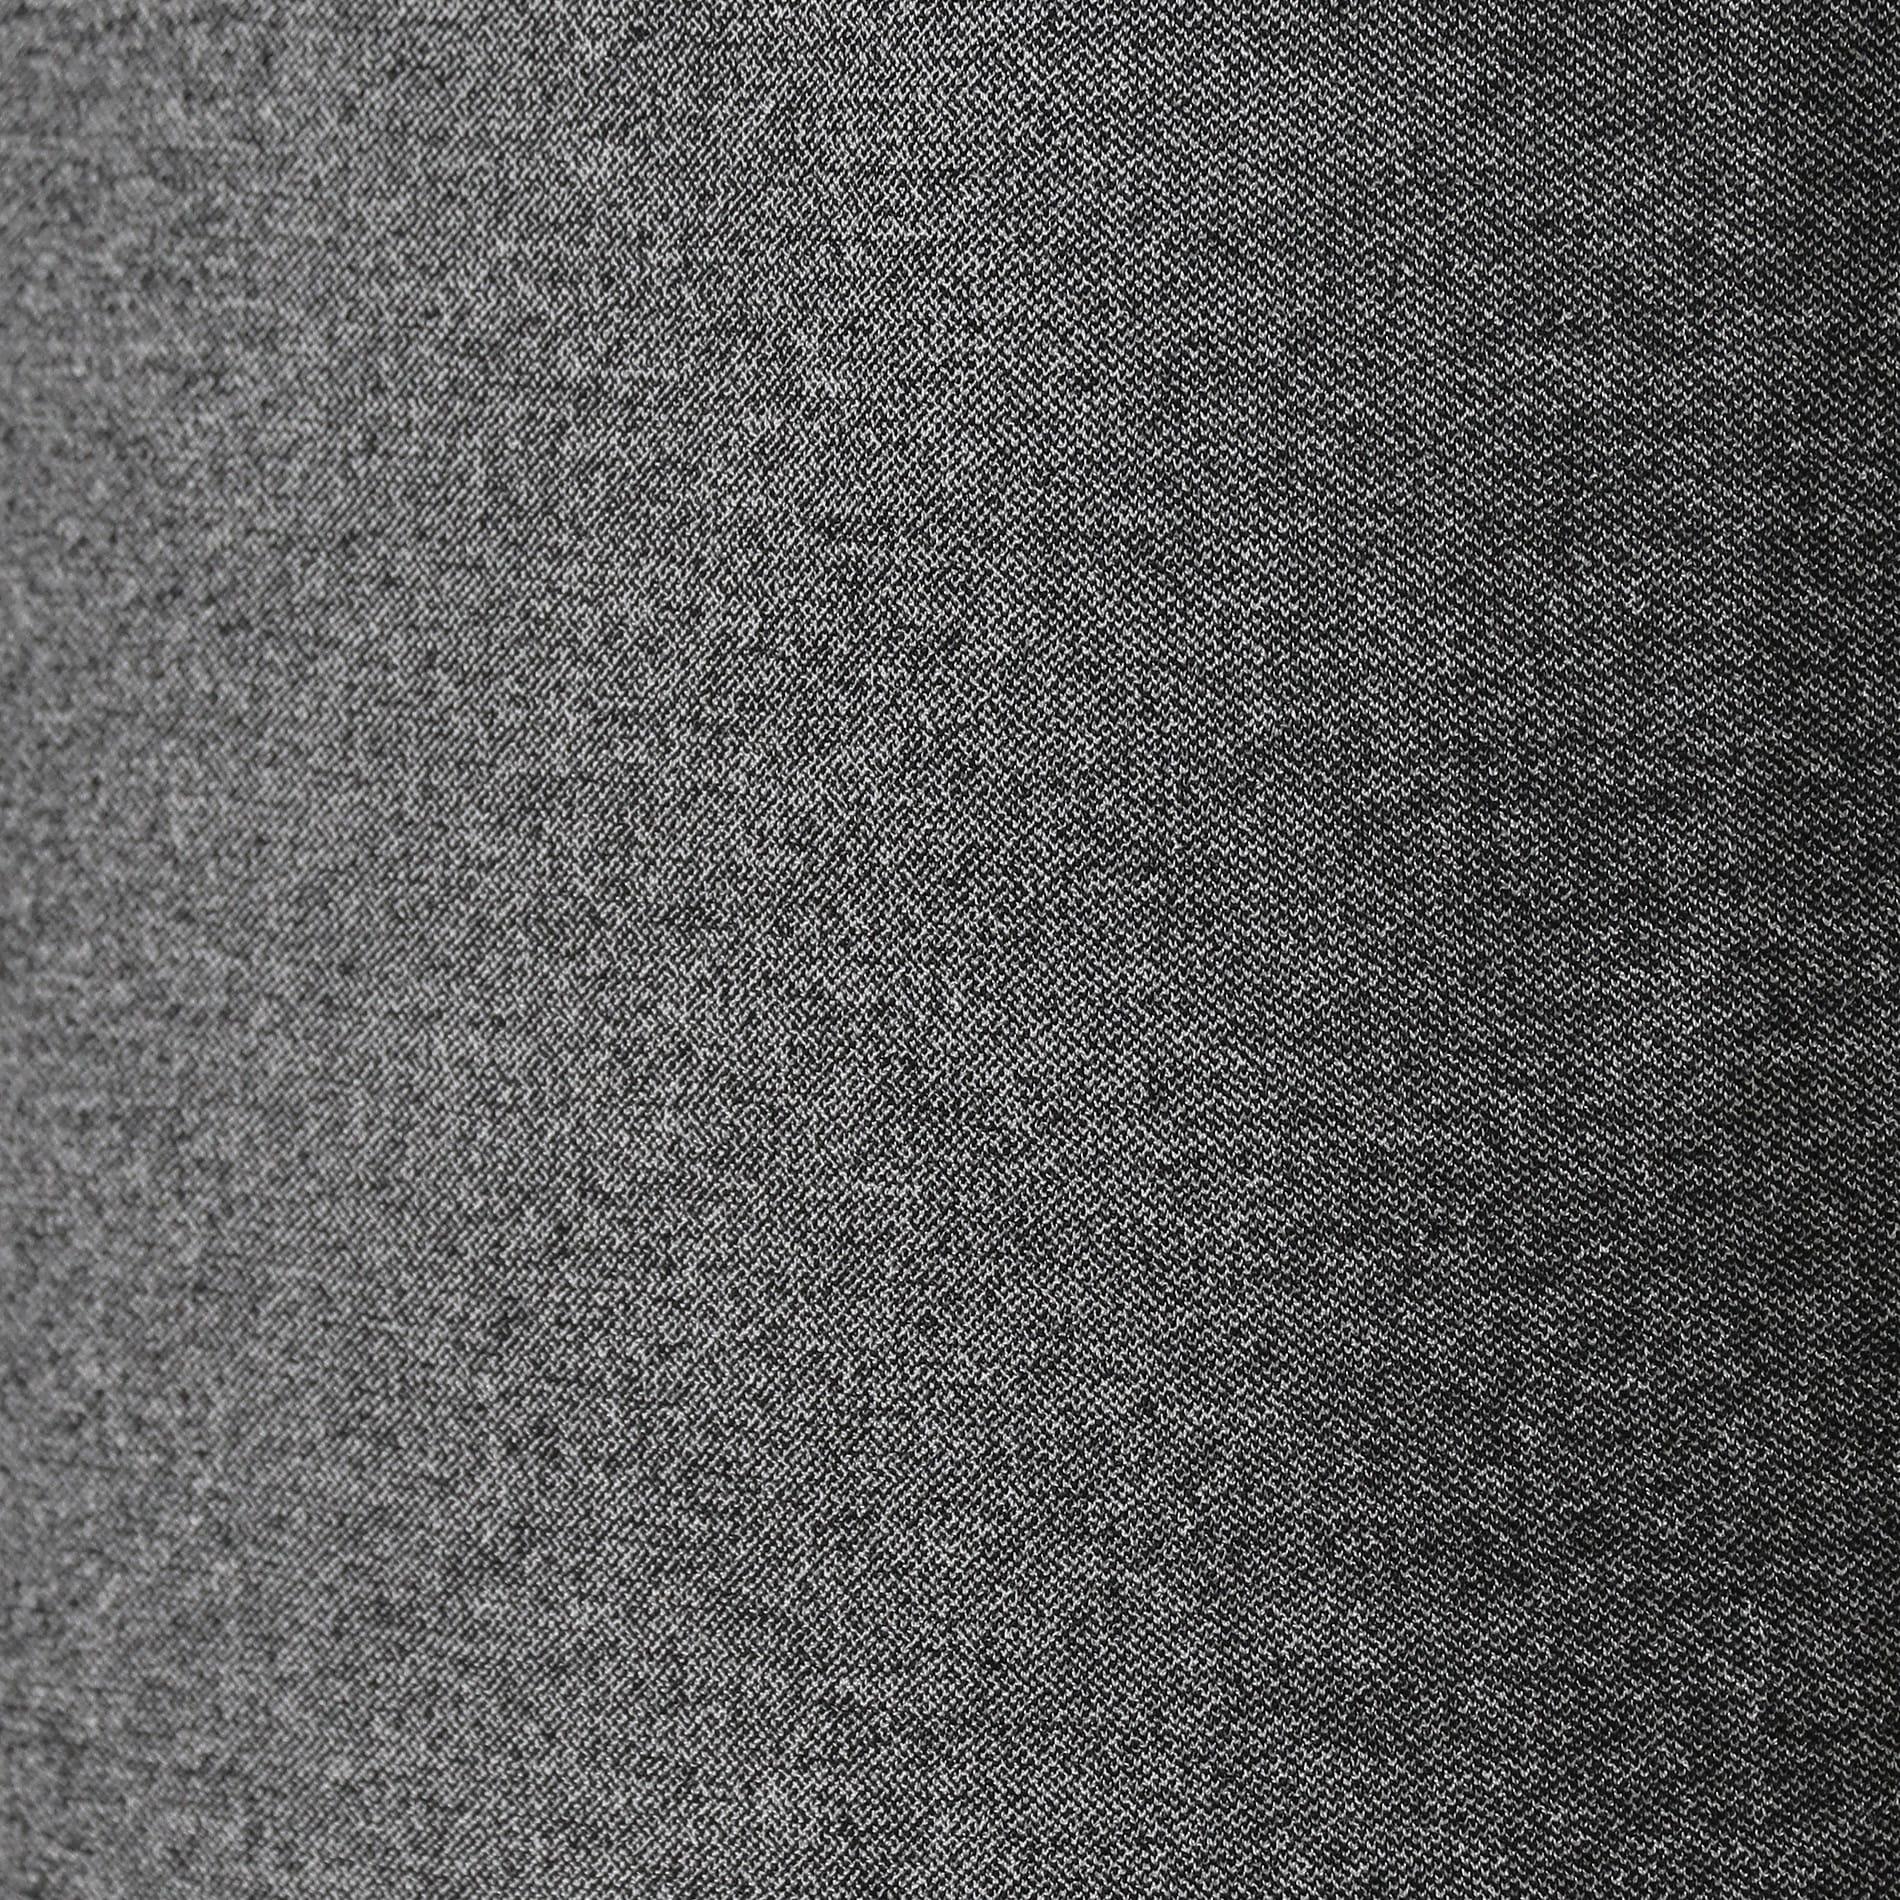 【24 TWENTY FOUR】タイトスカート